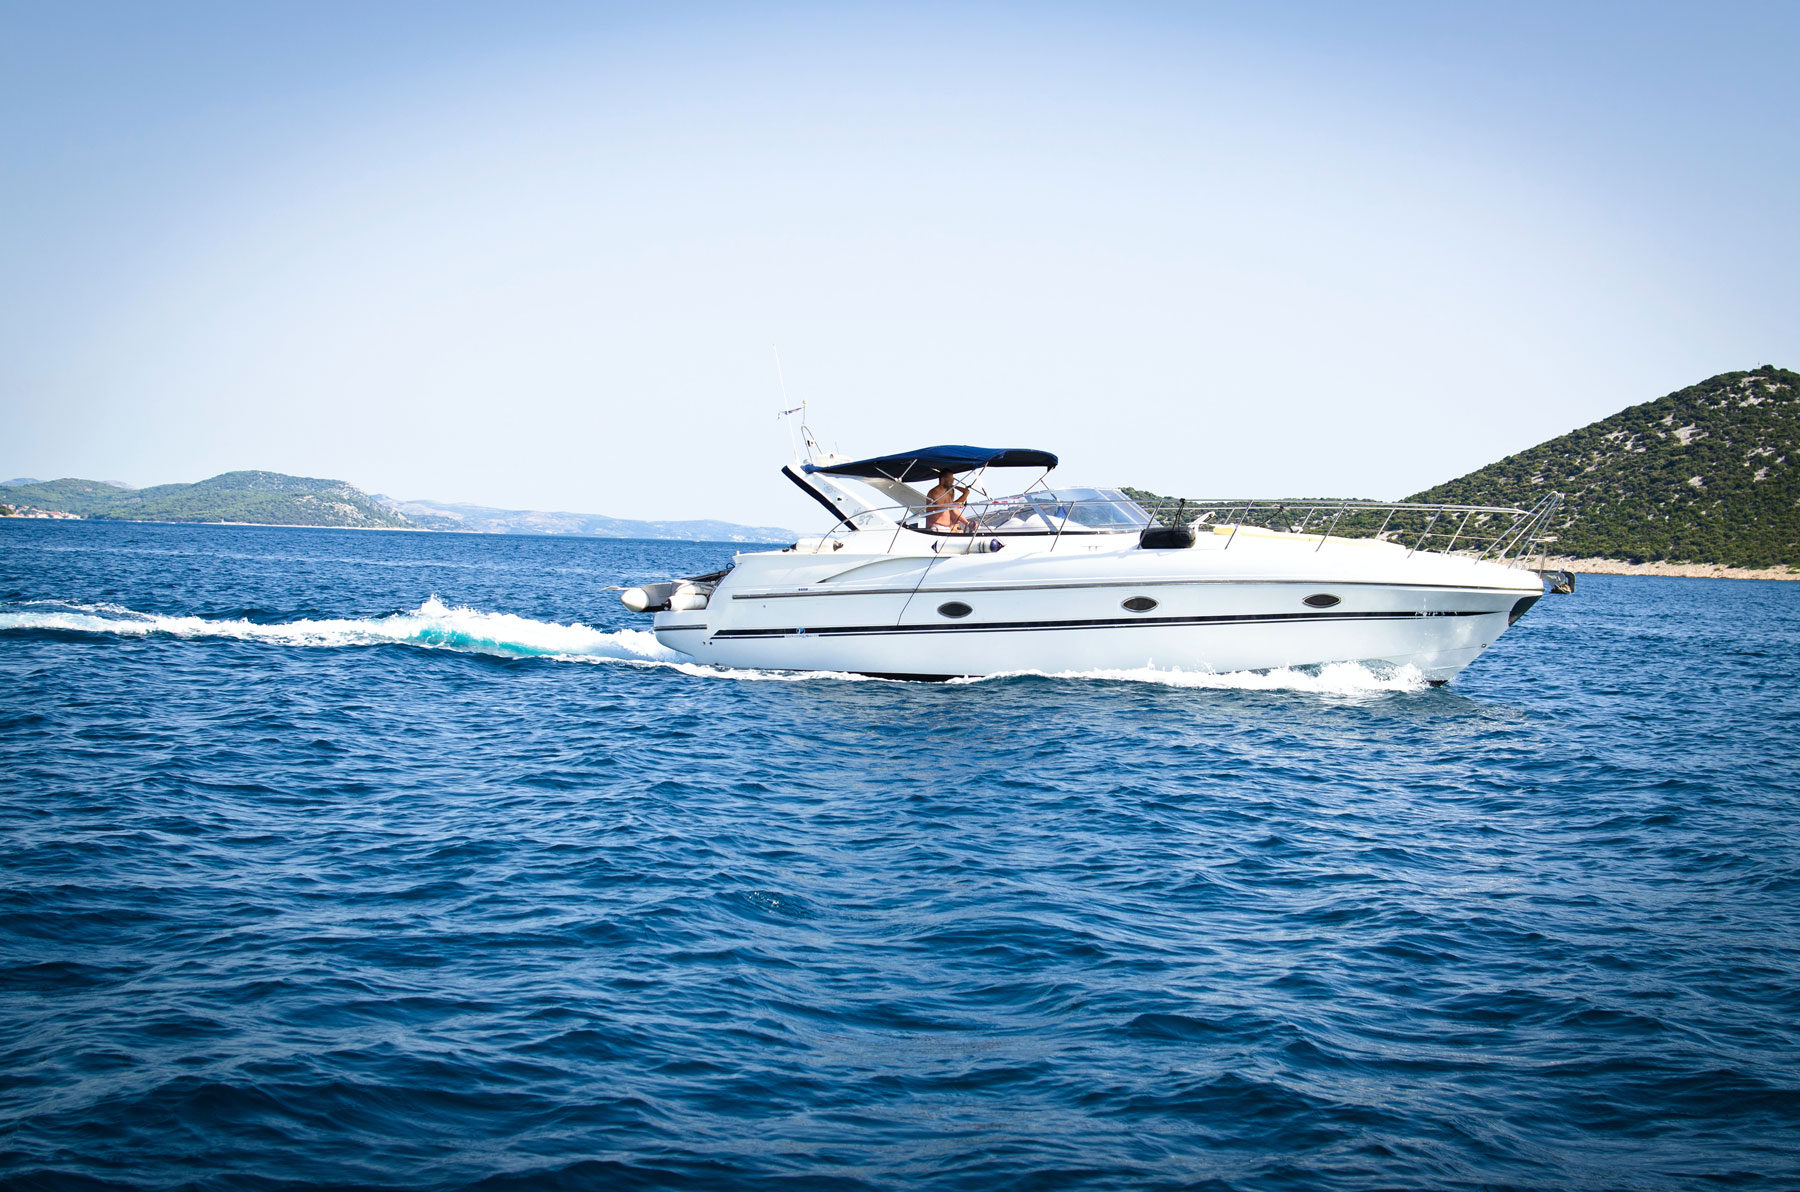 yacht boat sailing on lake